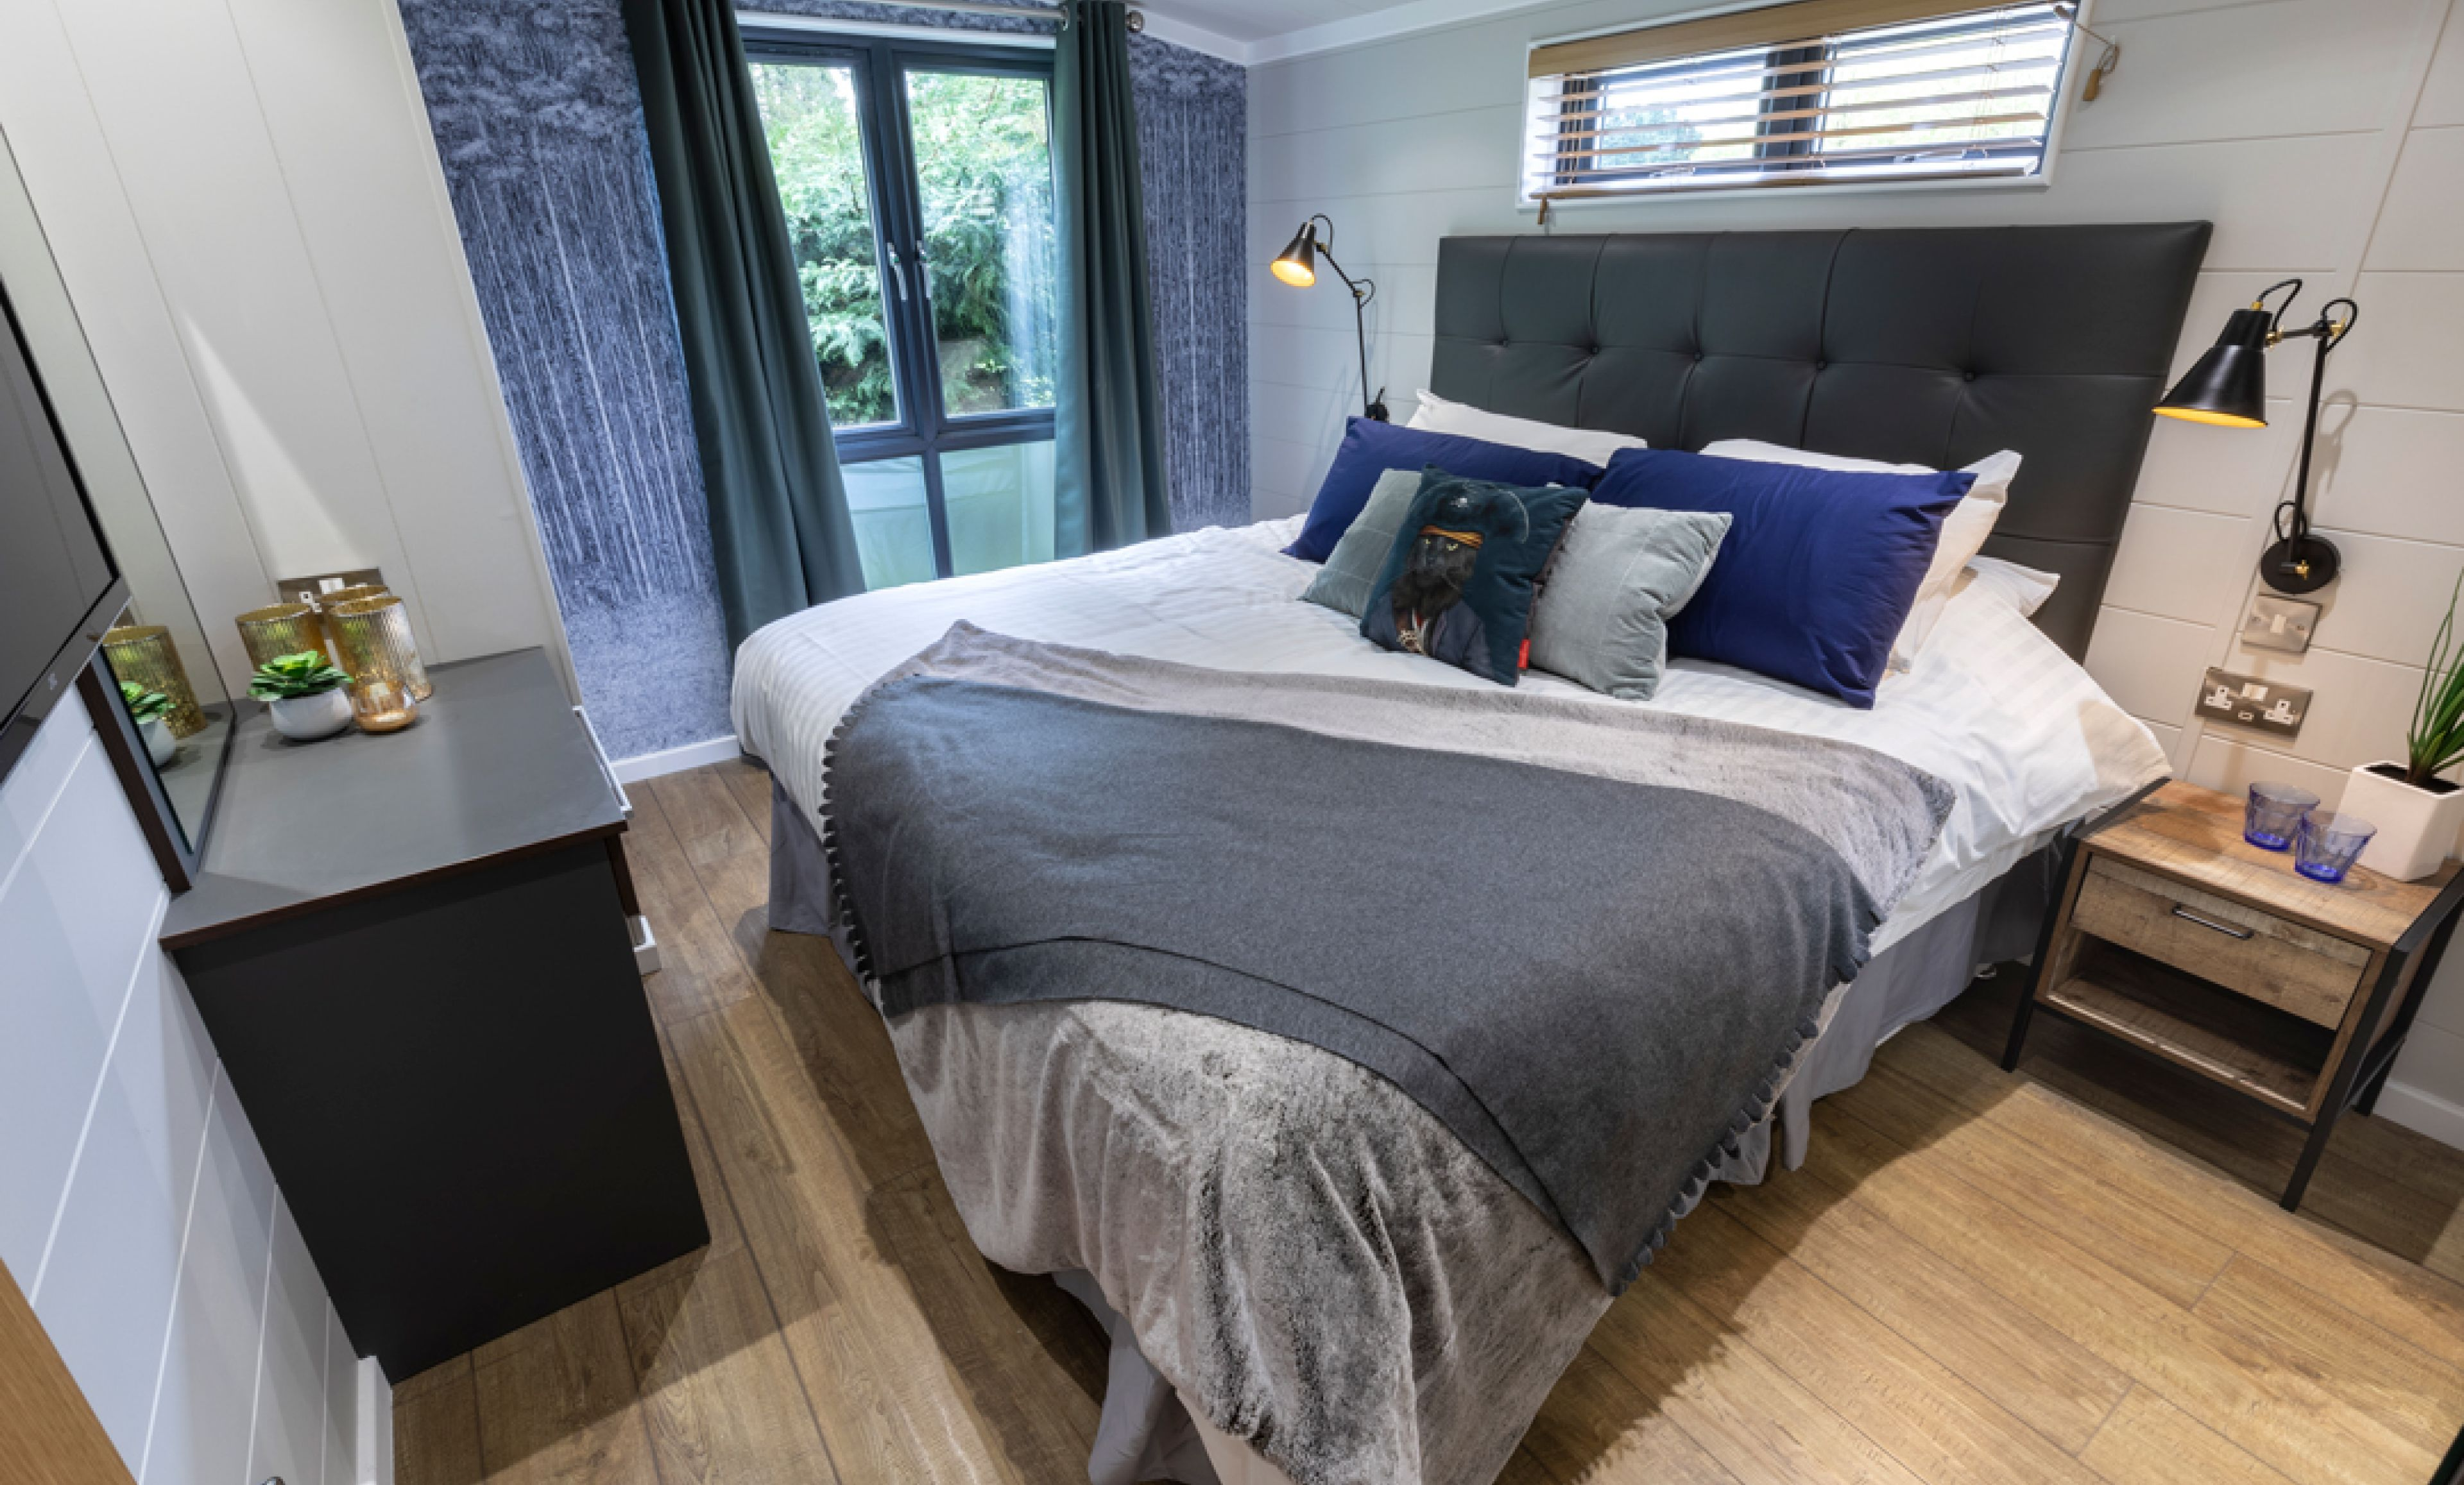 The Sherwood Bedroom